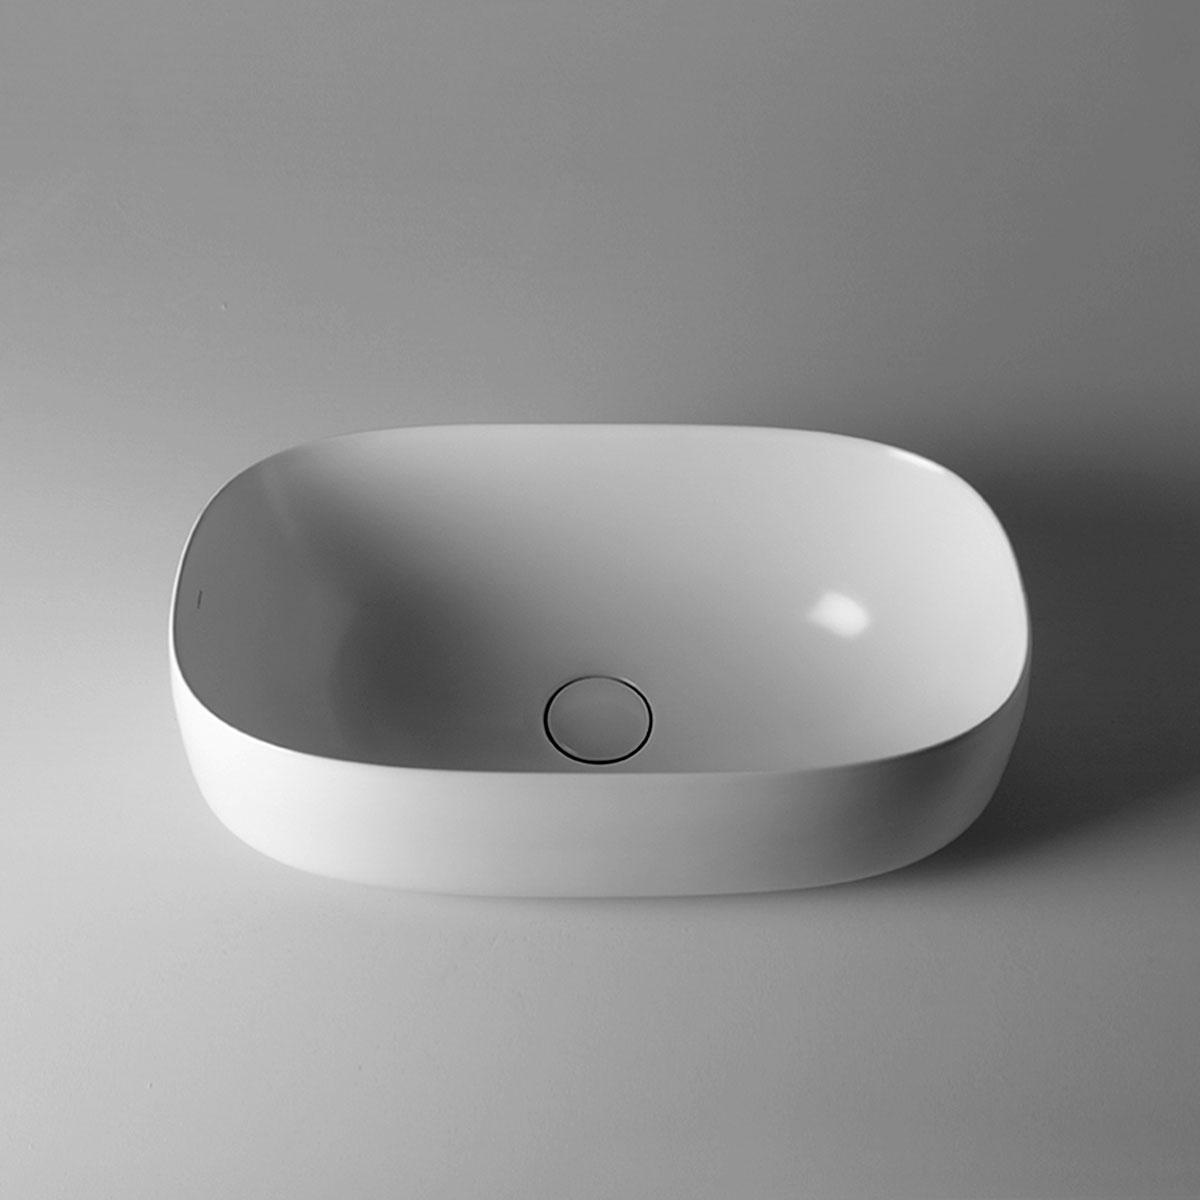 Seed 55.30 - SEL06 Bathroom Sink